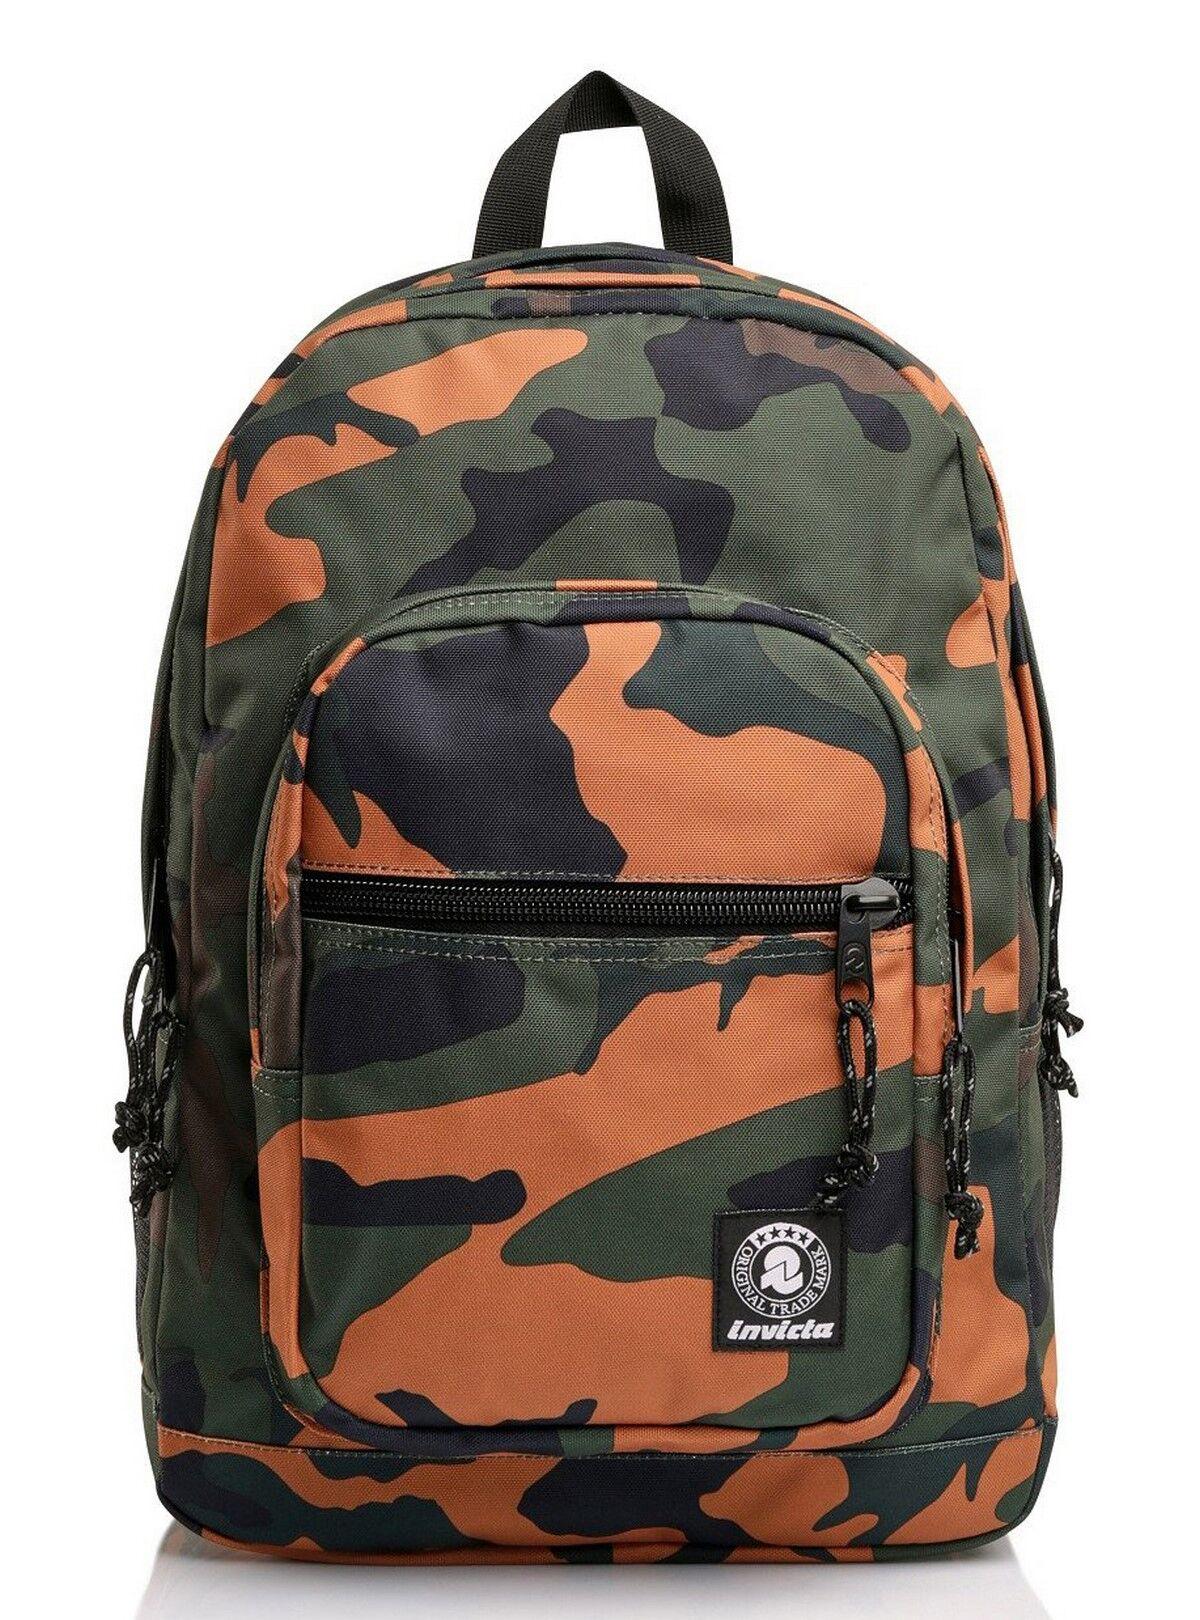 invicta zaino scuola invicta jelek camouflage